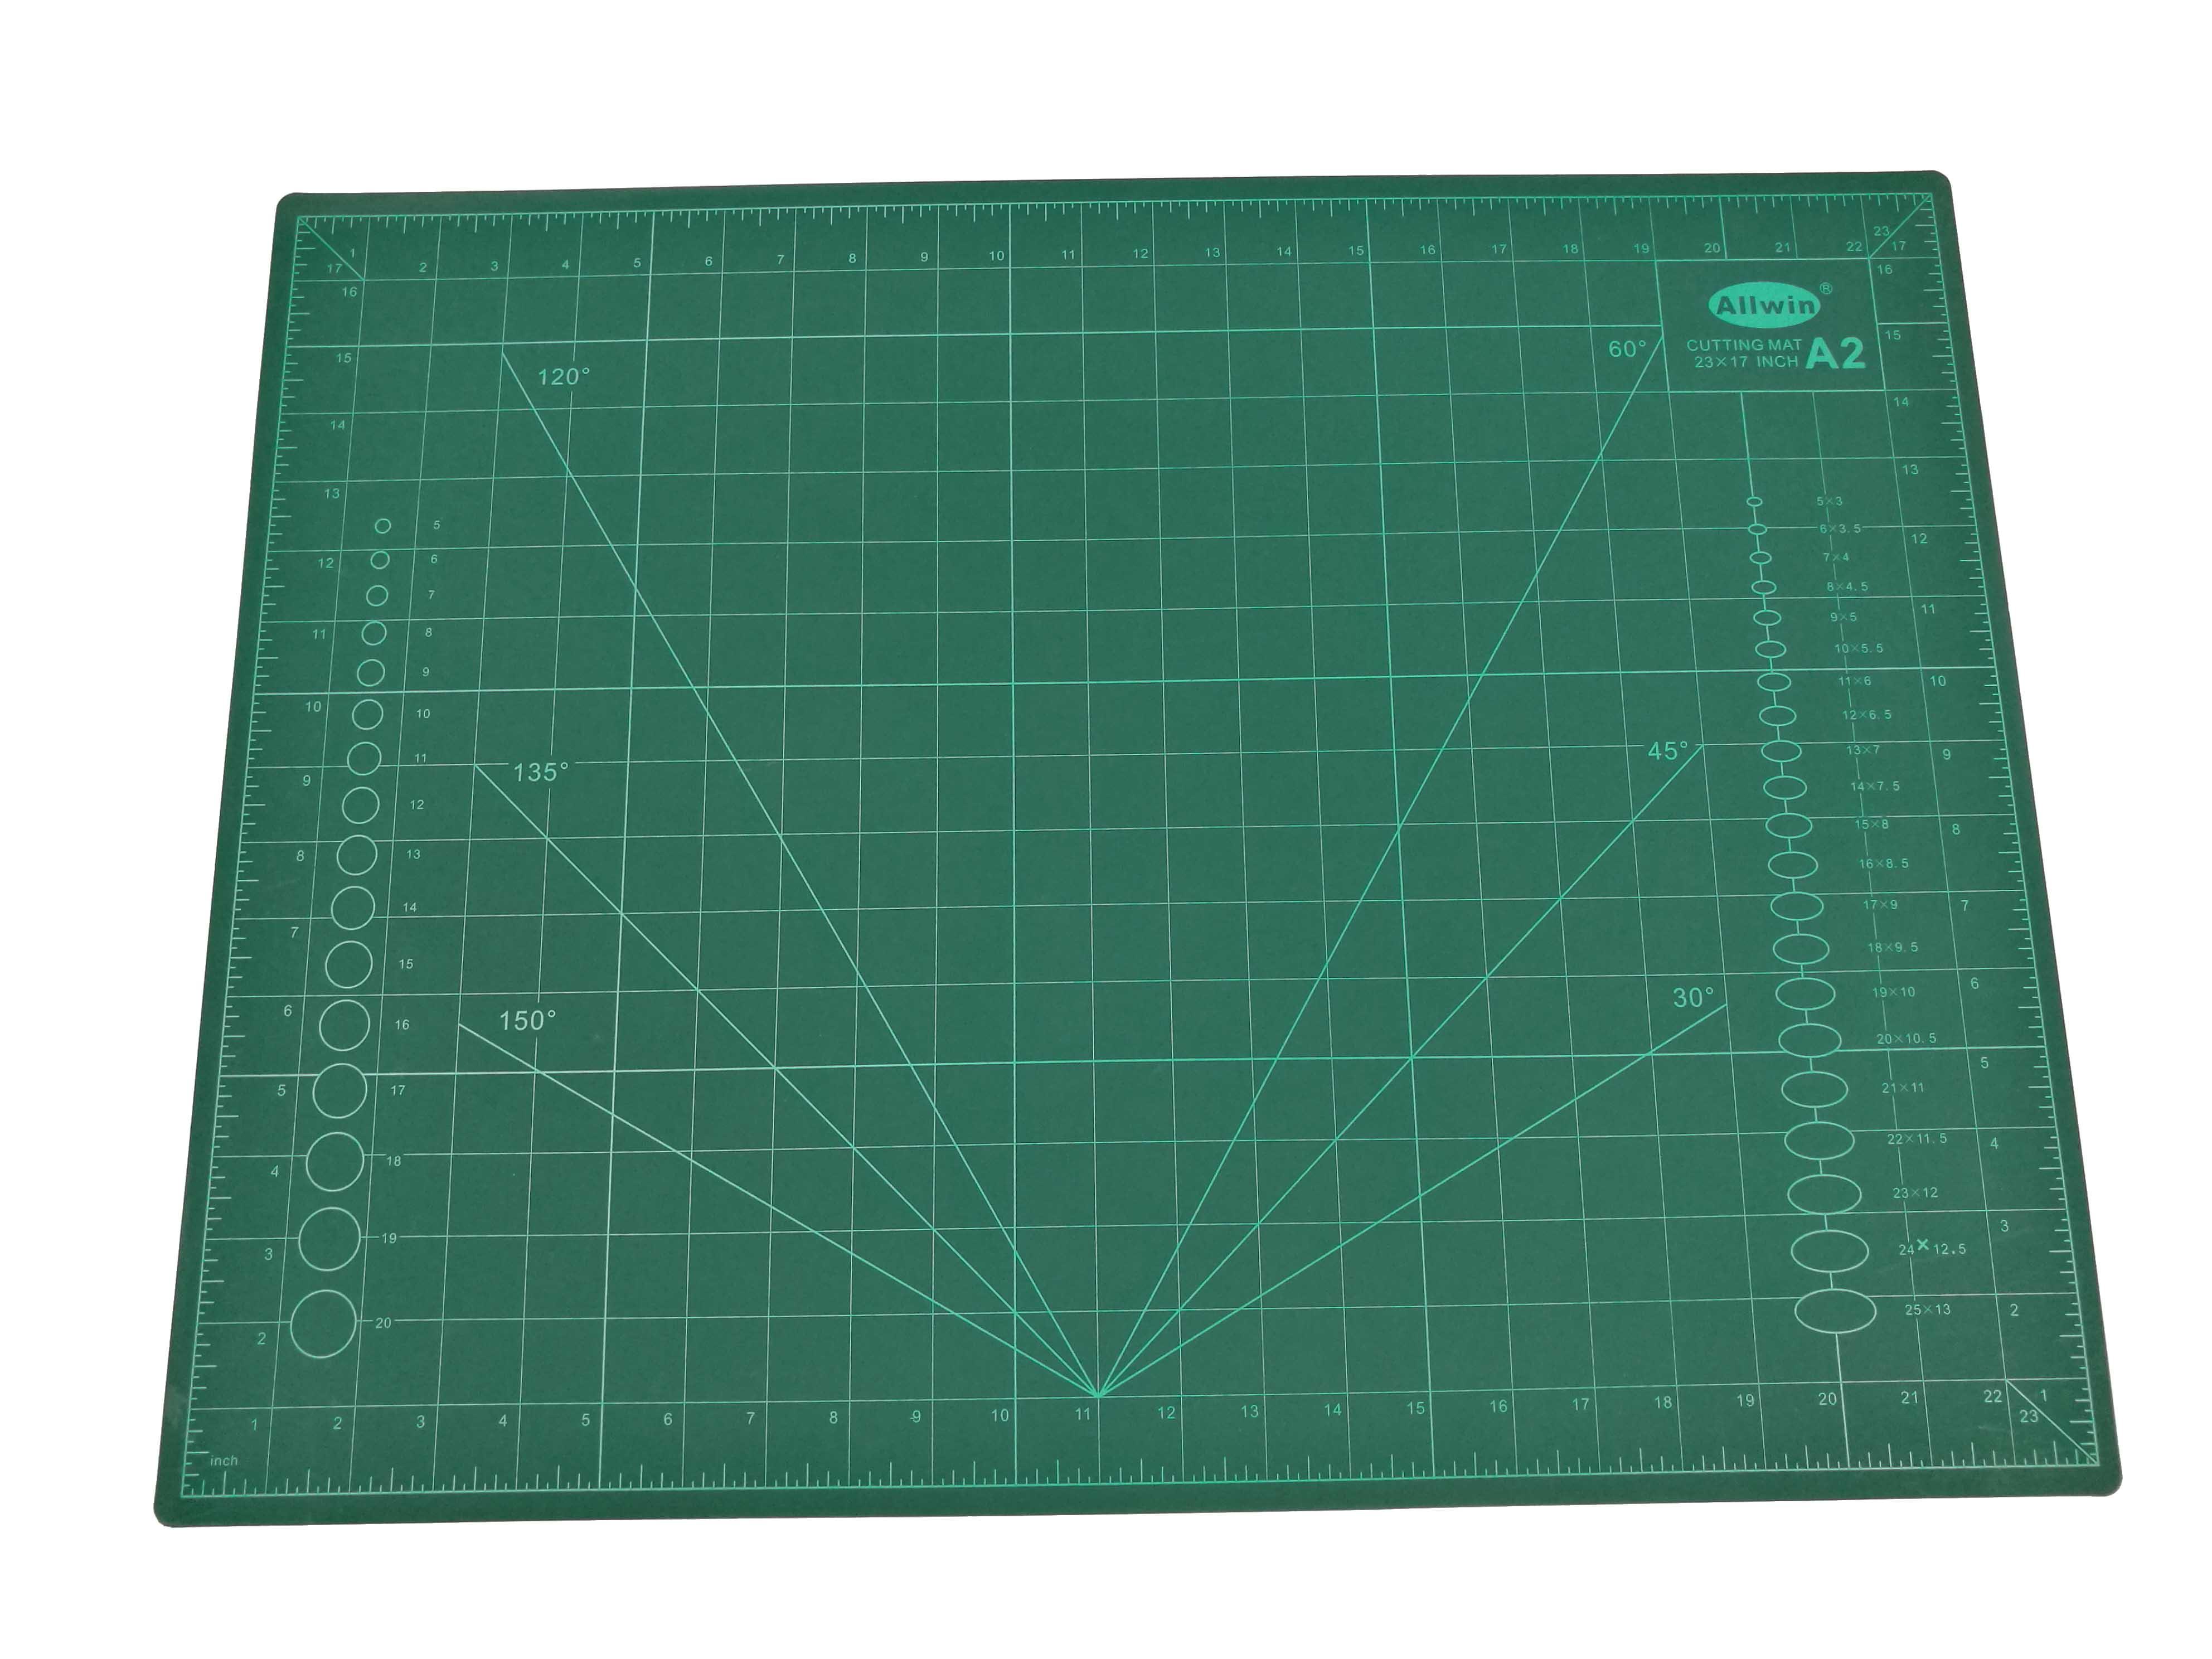 UnbeatableSale: Dritz 850 Iron Safe Clear Nylon Sew-On Snaps